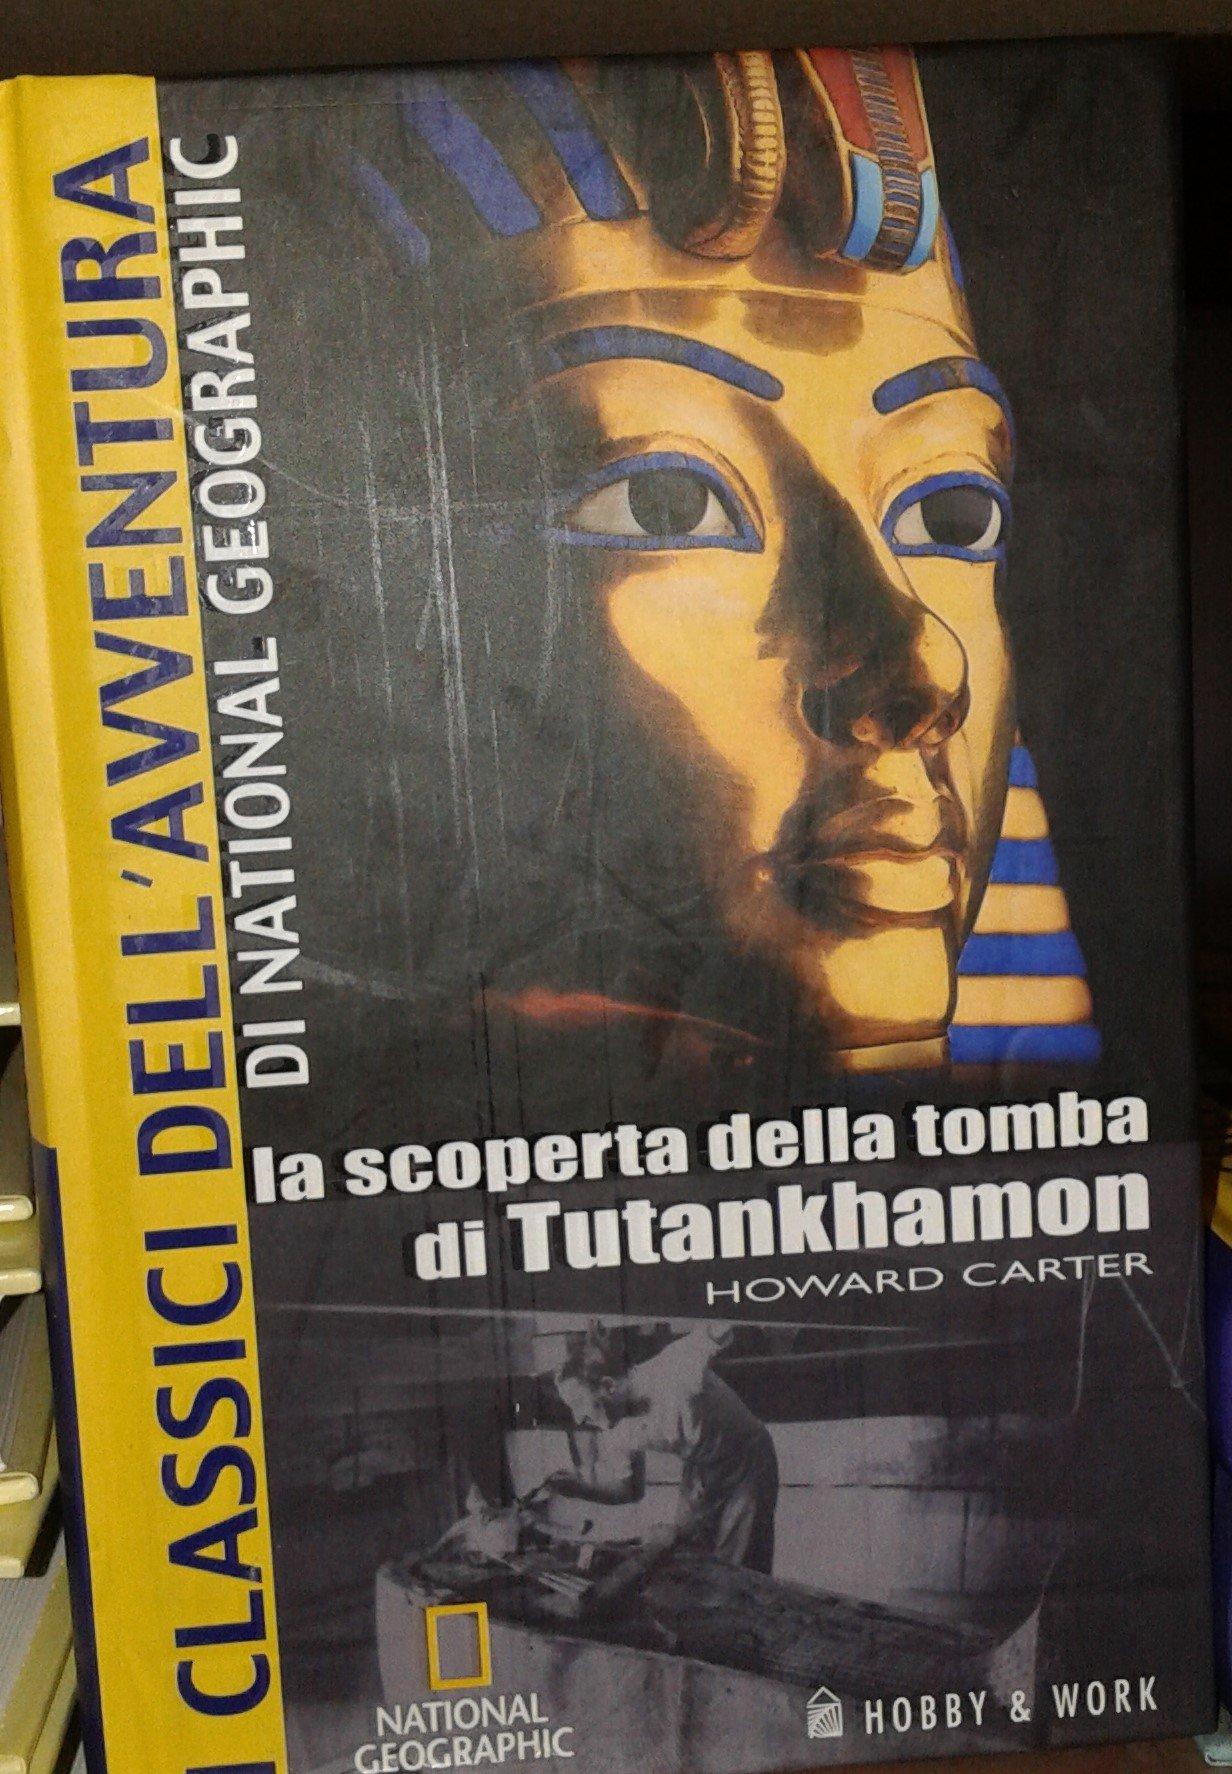 La scoperta della tomba di Tutankhamon I classici dellavventura: Amazon.es: Carter, Howard: Libros en idiomas extranjeros